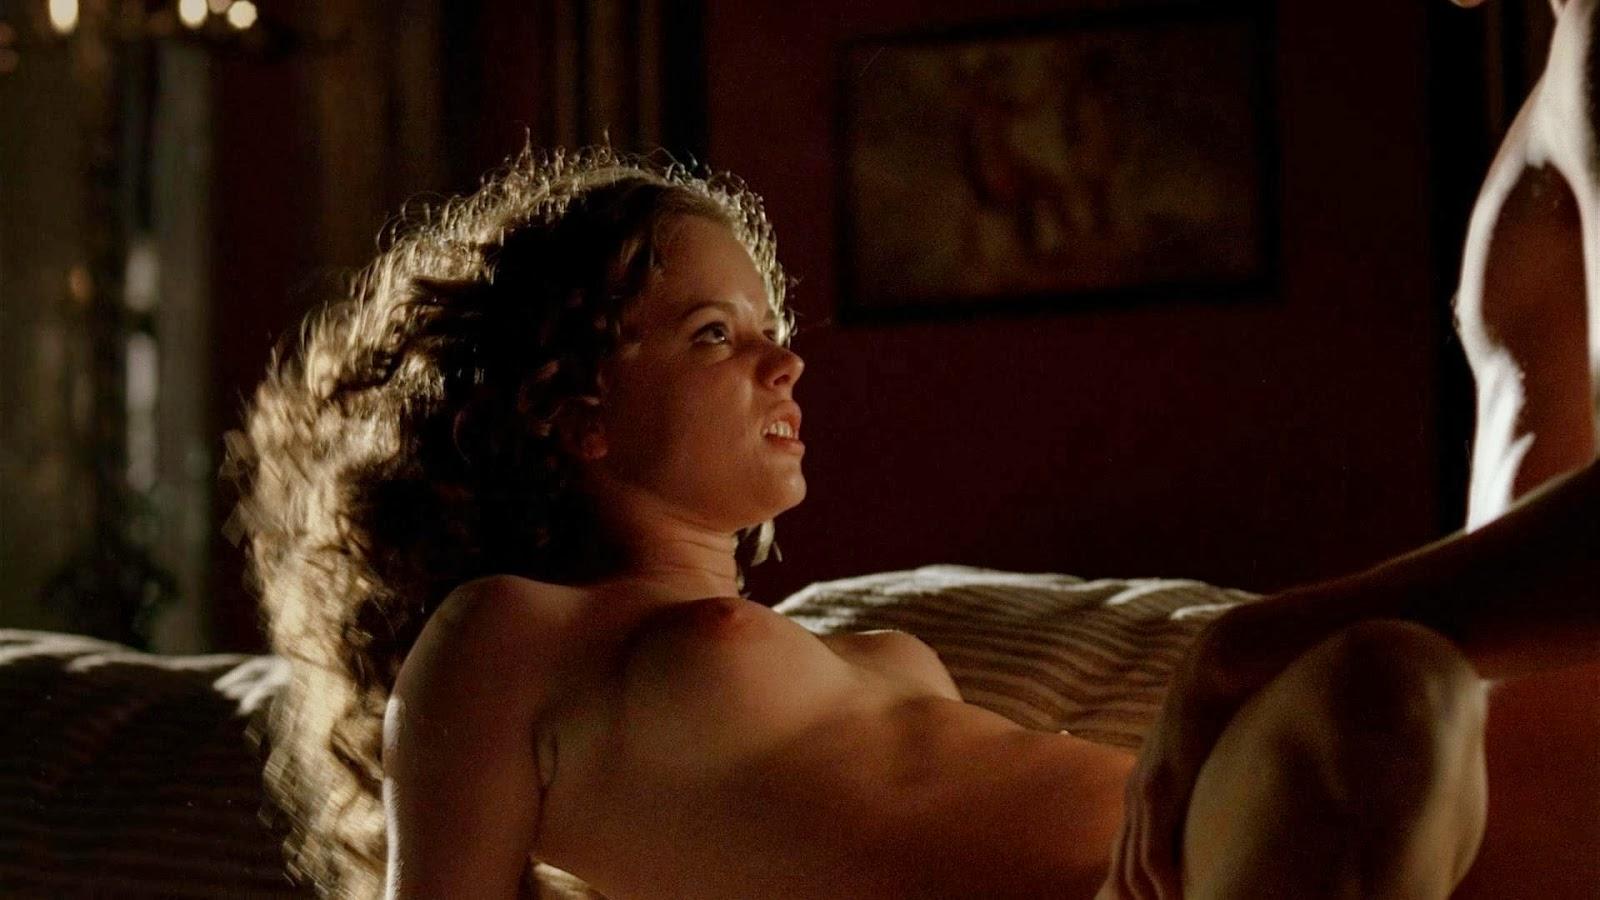 Angela Sarafyan Tits angela sarafyan westworld nude – thefappening library